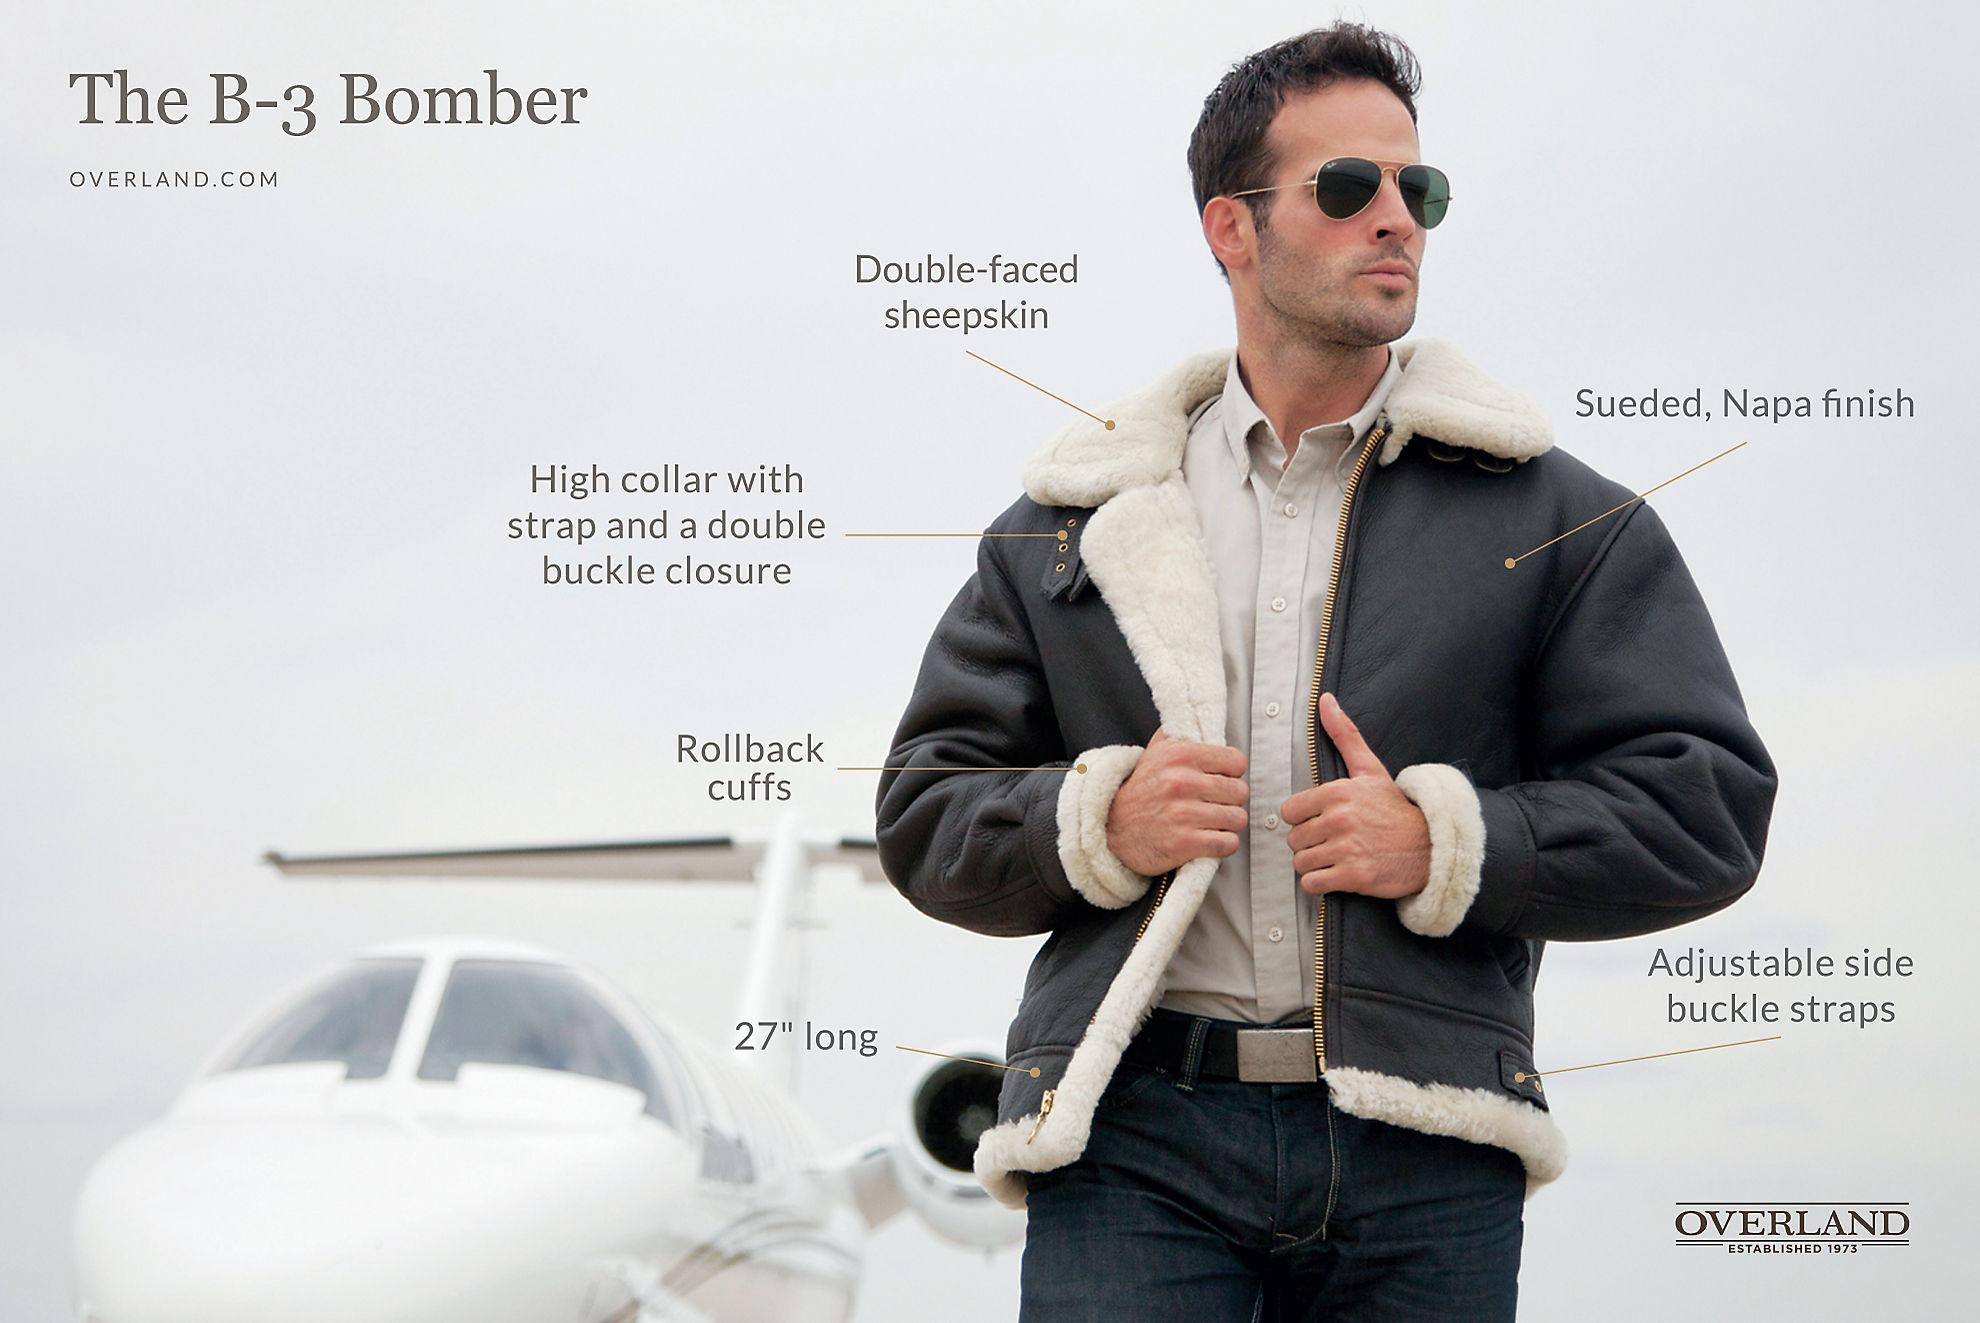 Classic Sheepskin B-3 Bomber Jacket with Detachable Hood